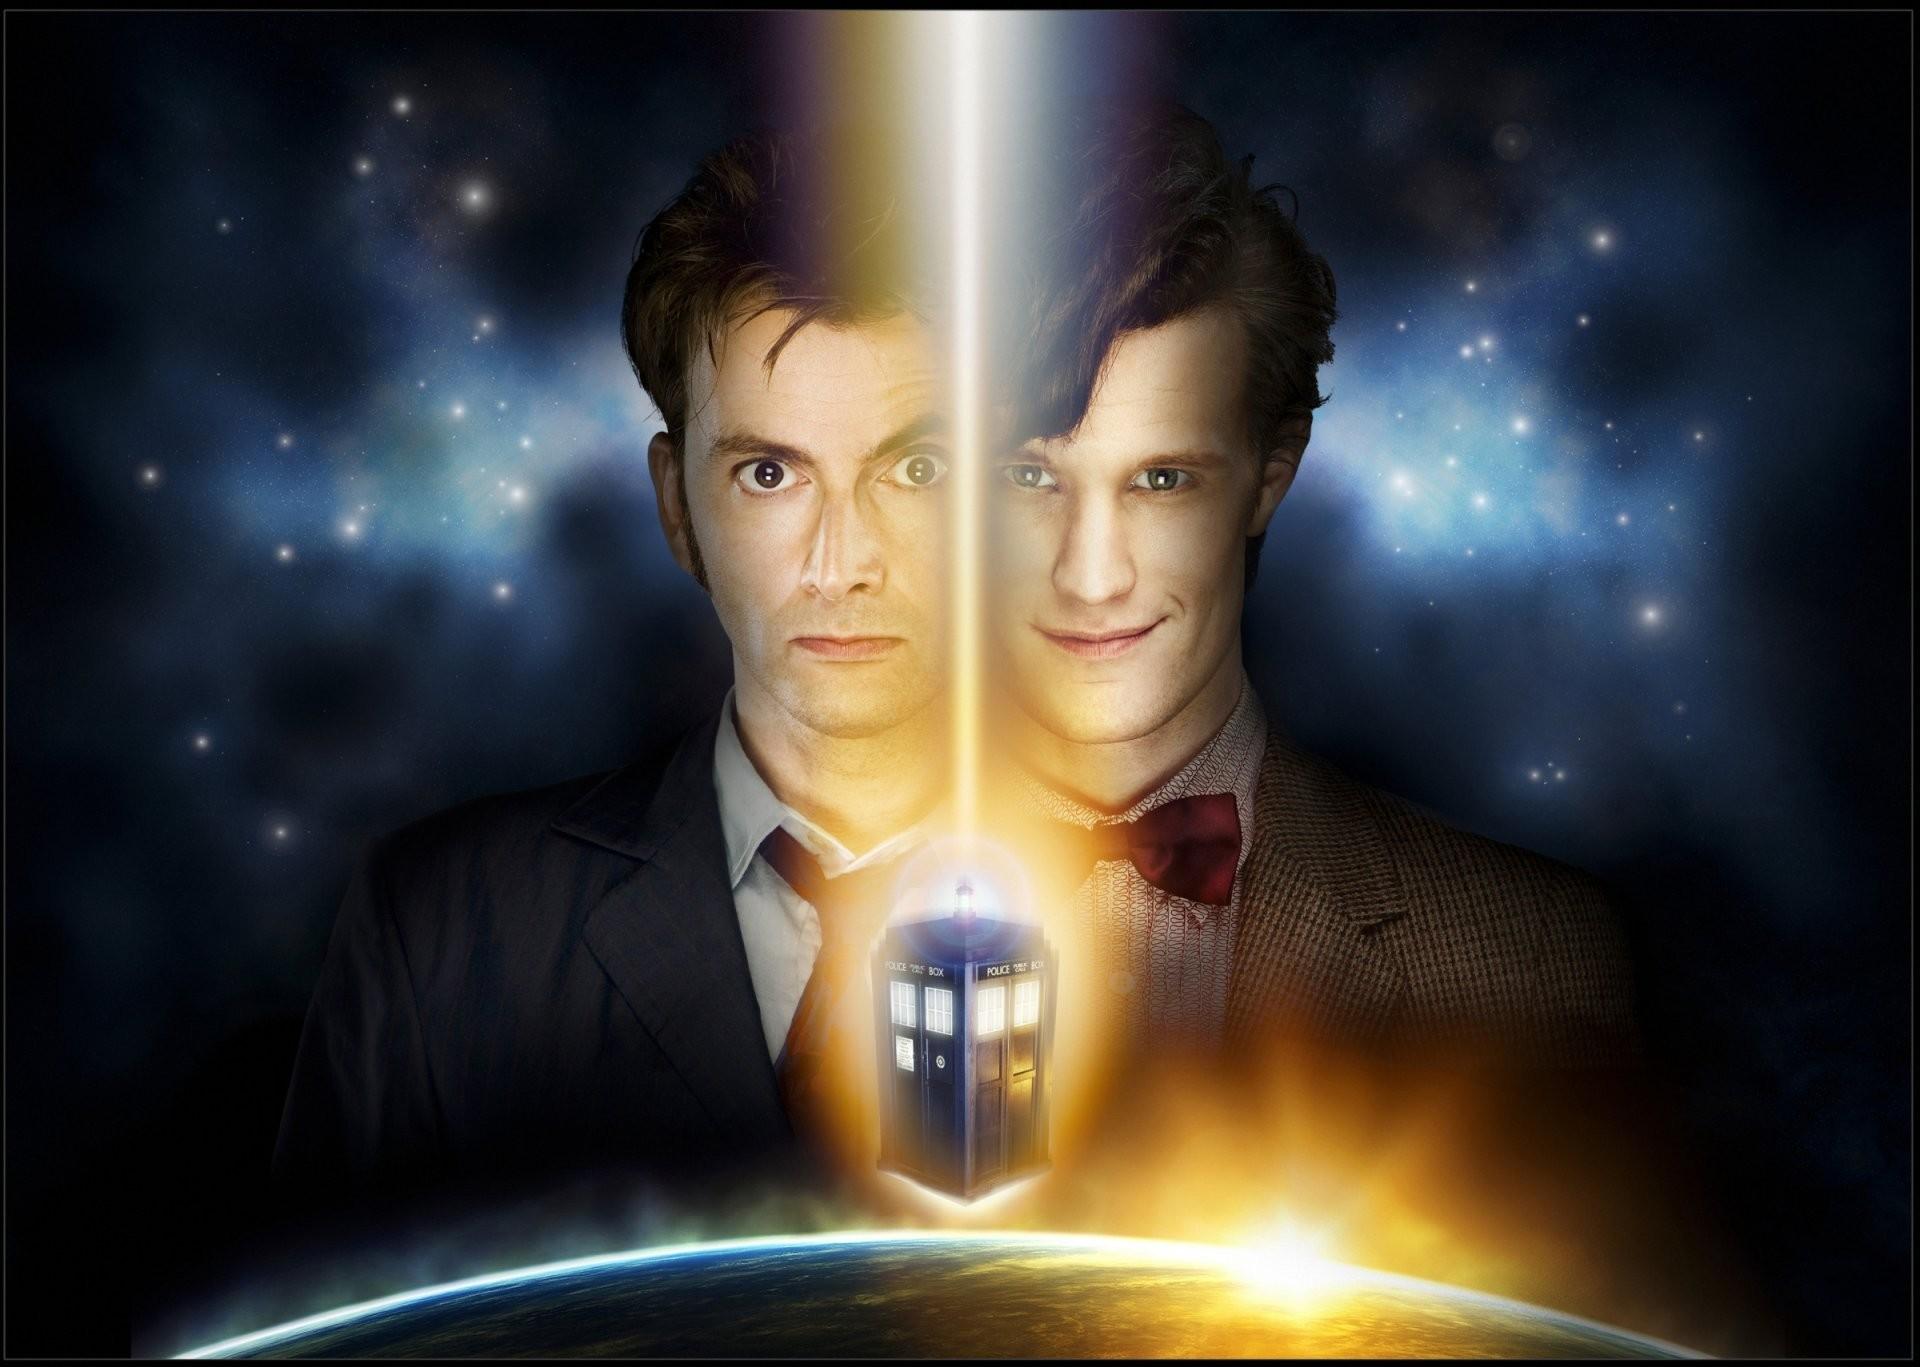 doctor who doctor who david tennant david tennant matt smith matt smith  space star police box